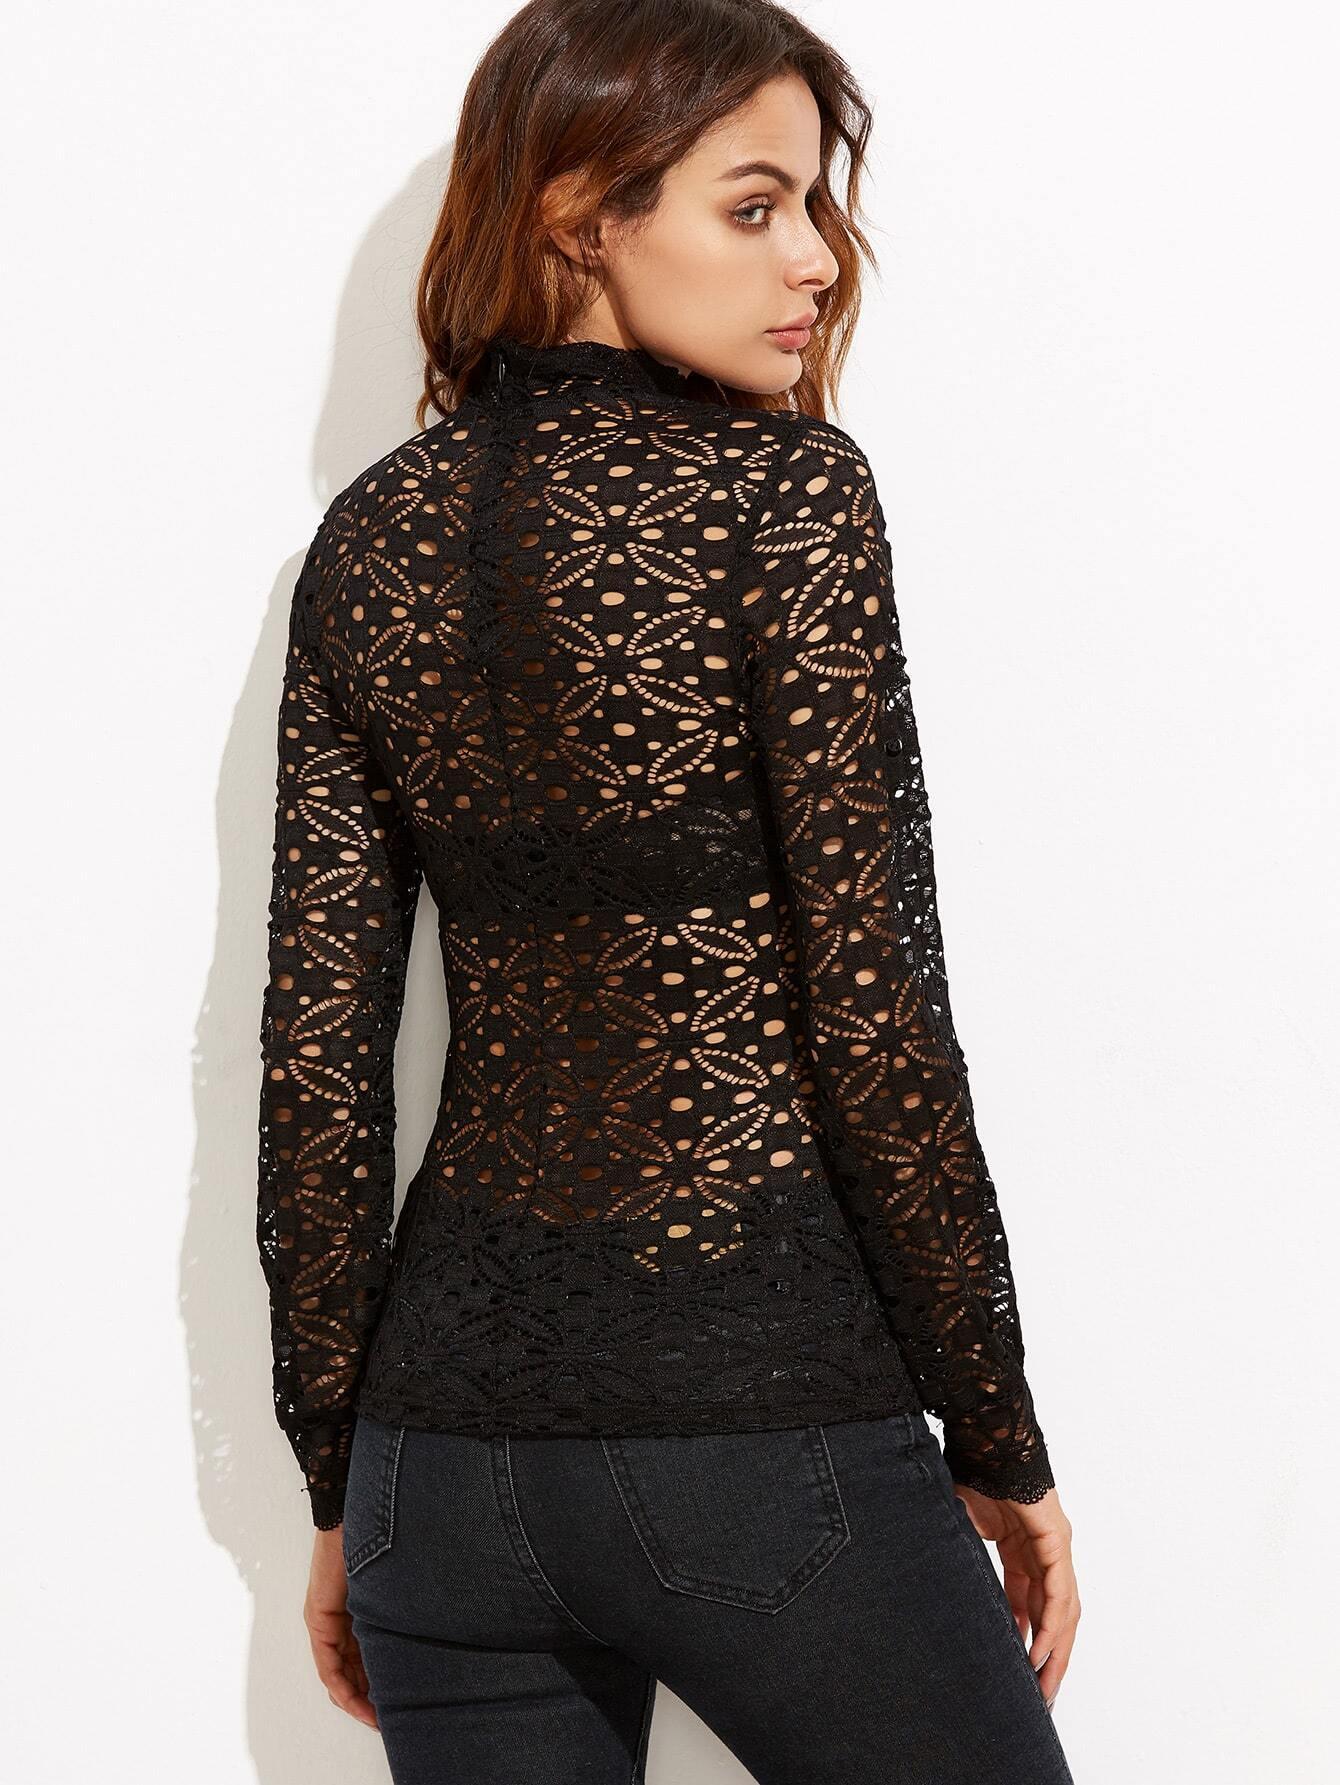 blouse161003705_2